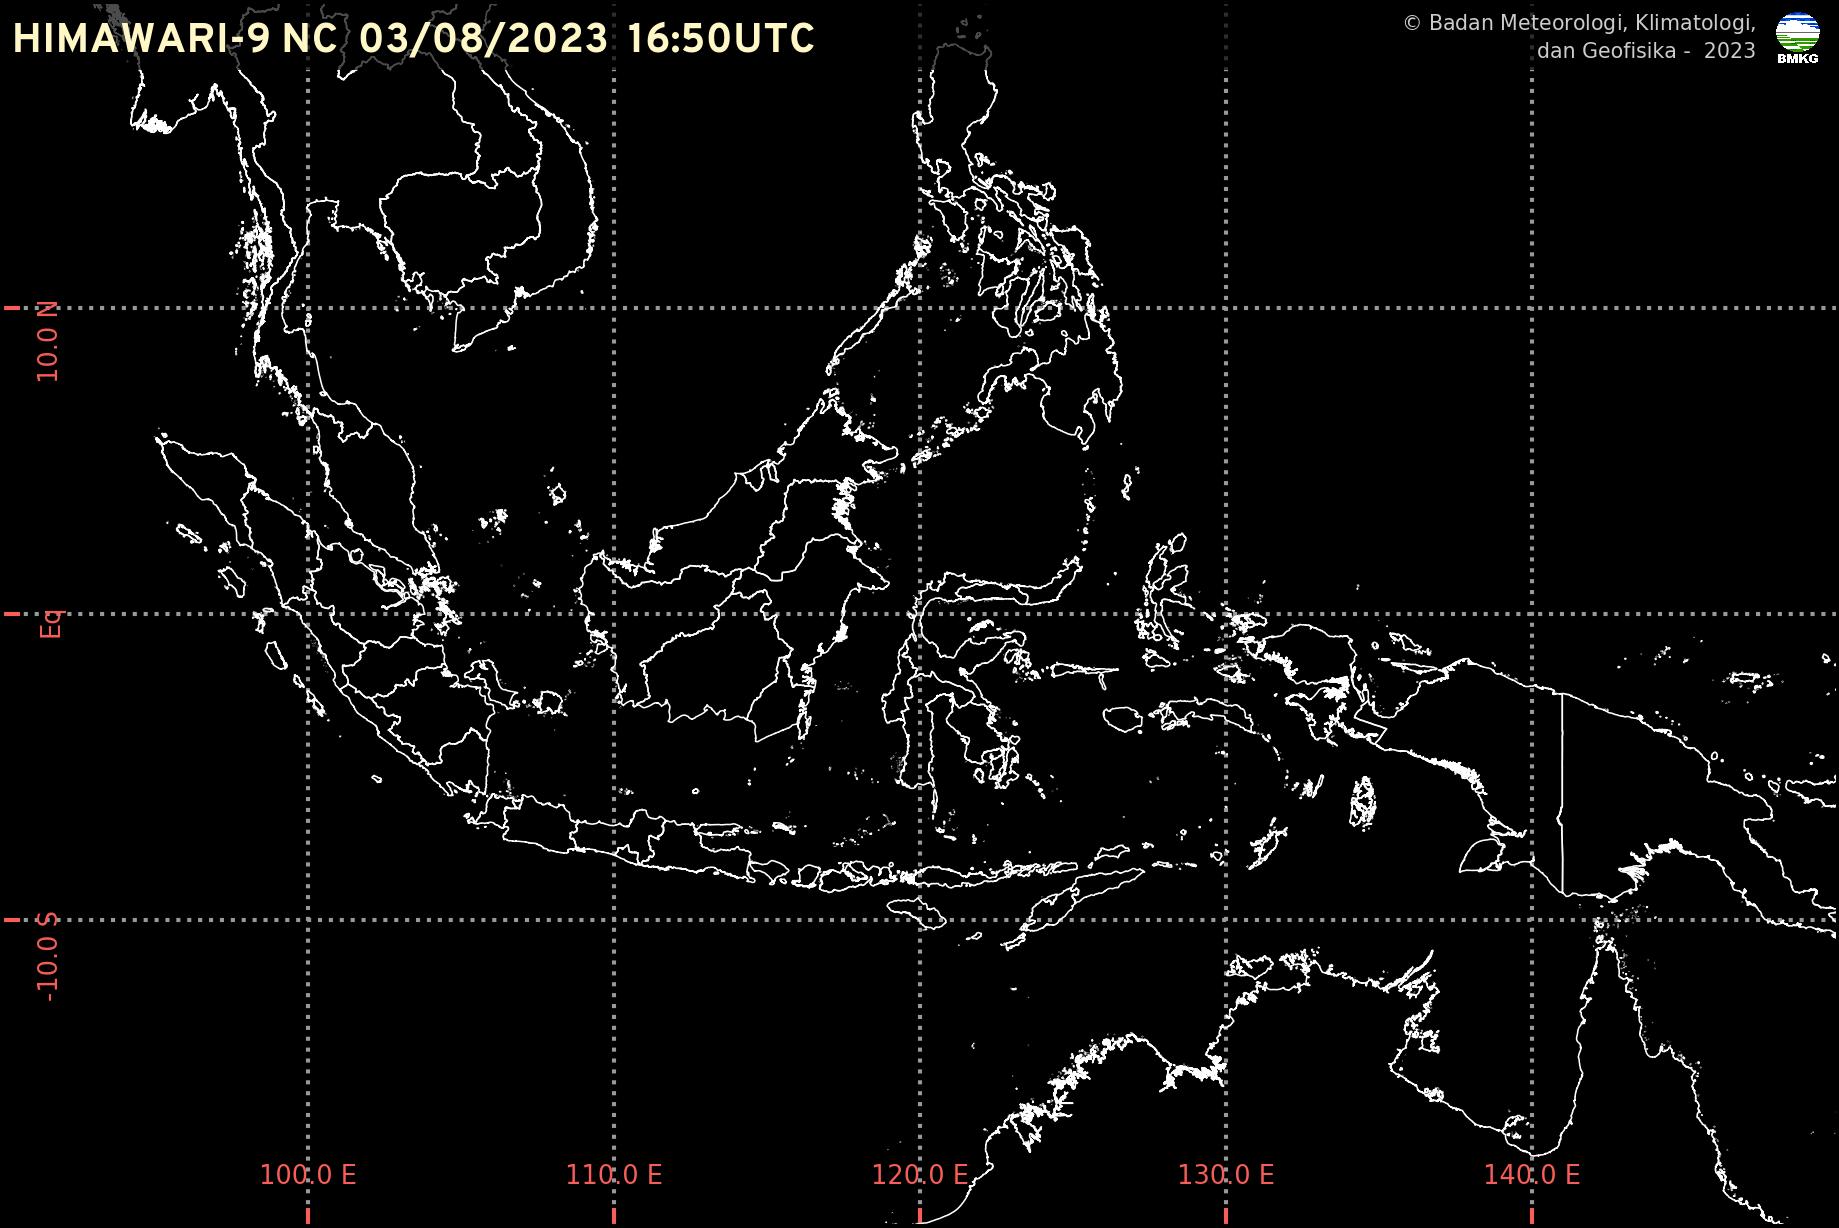 https://i2.wp.com/satelit.bmkg.go.id/IMAGE/HIMA/H08_NC_Indonesia.png